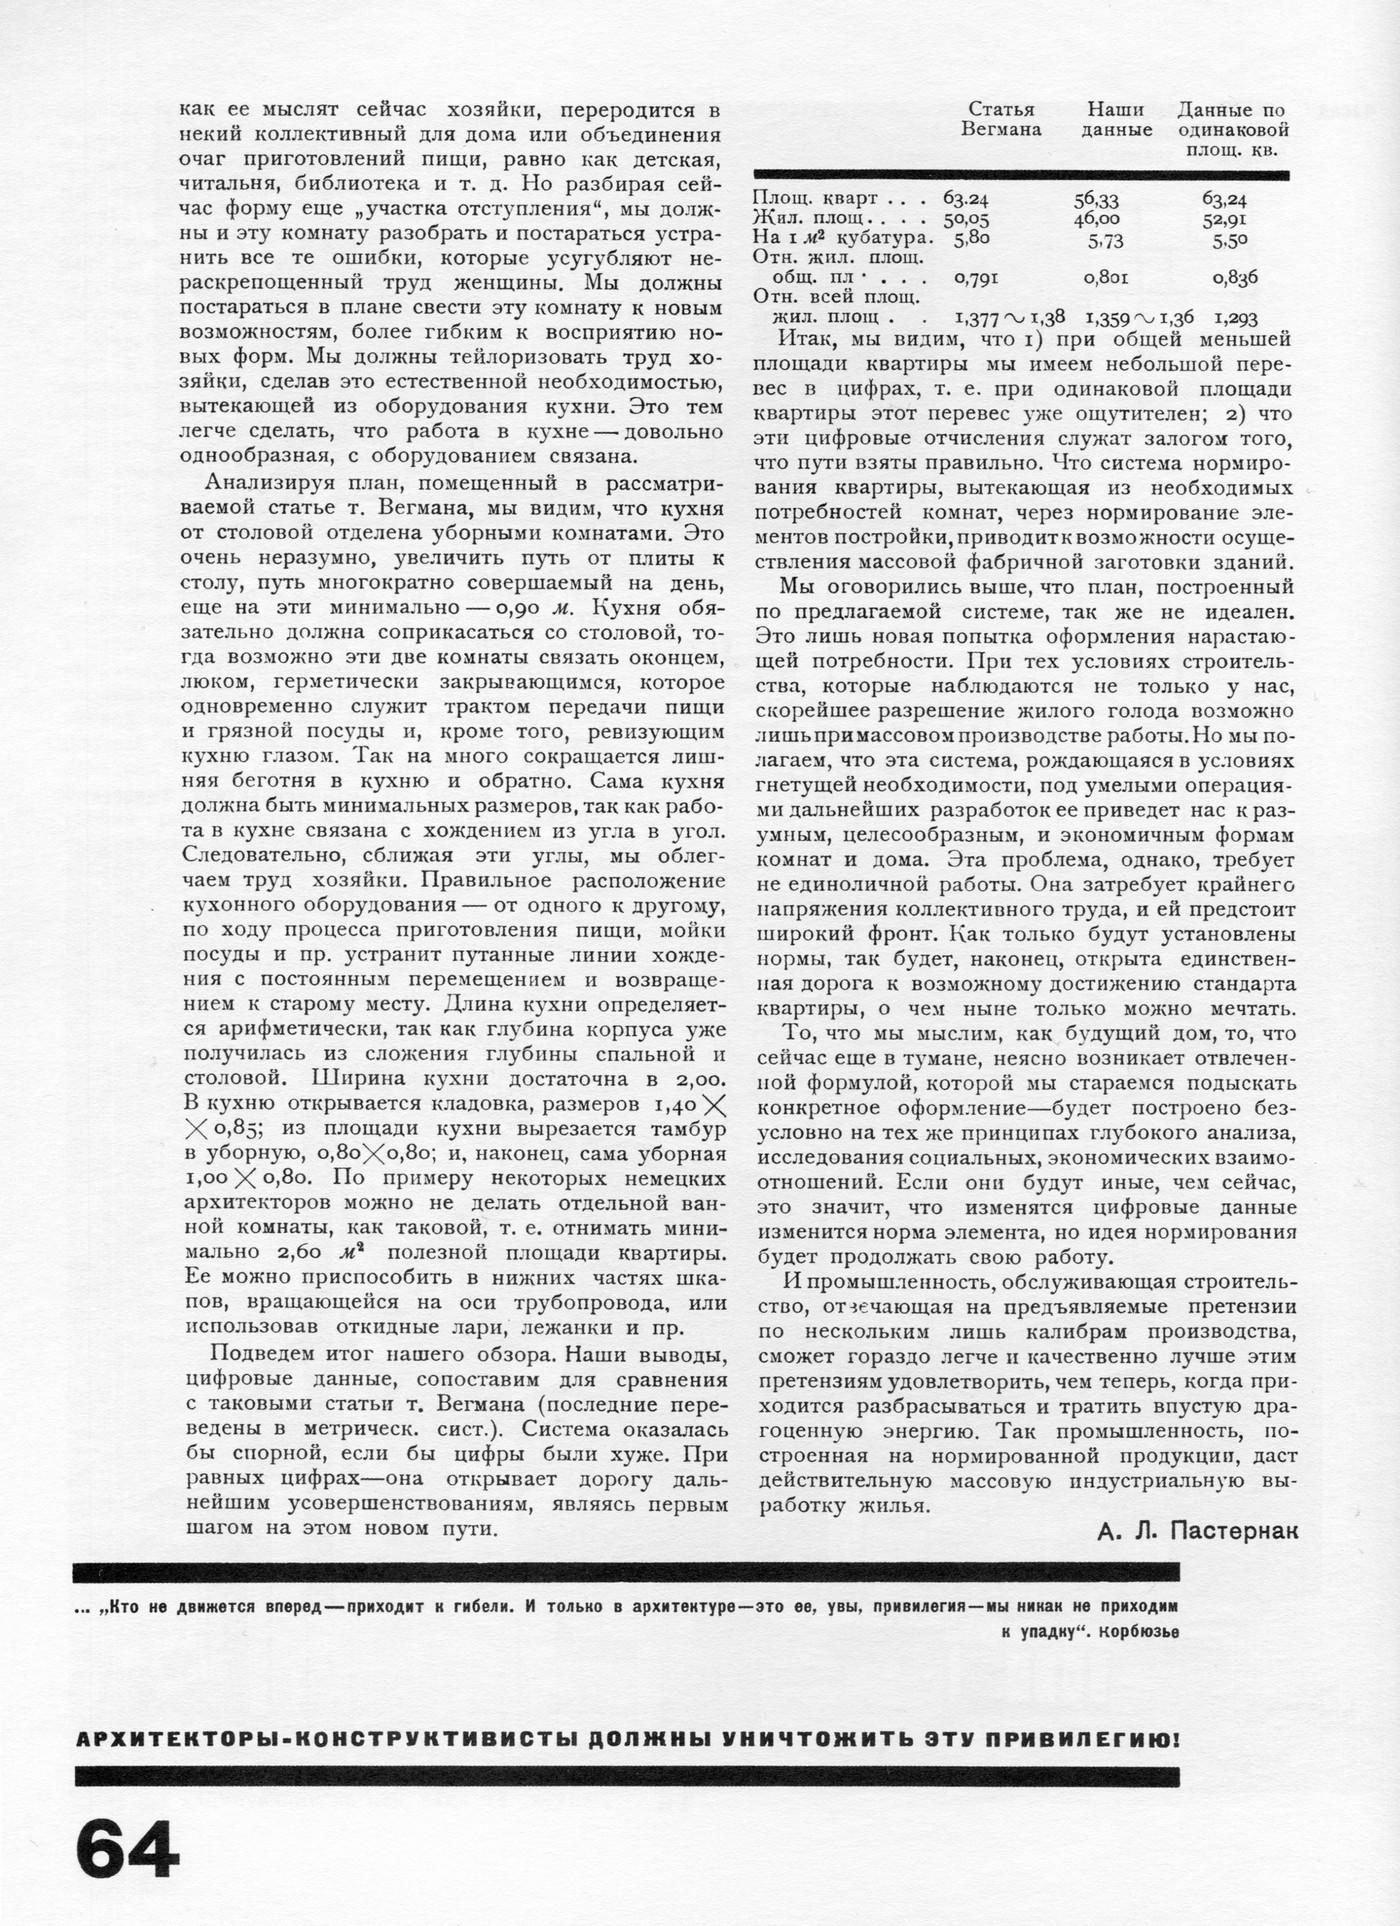 tehne.com-sa-1927-2-1400-020